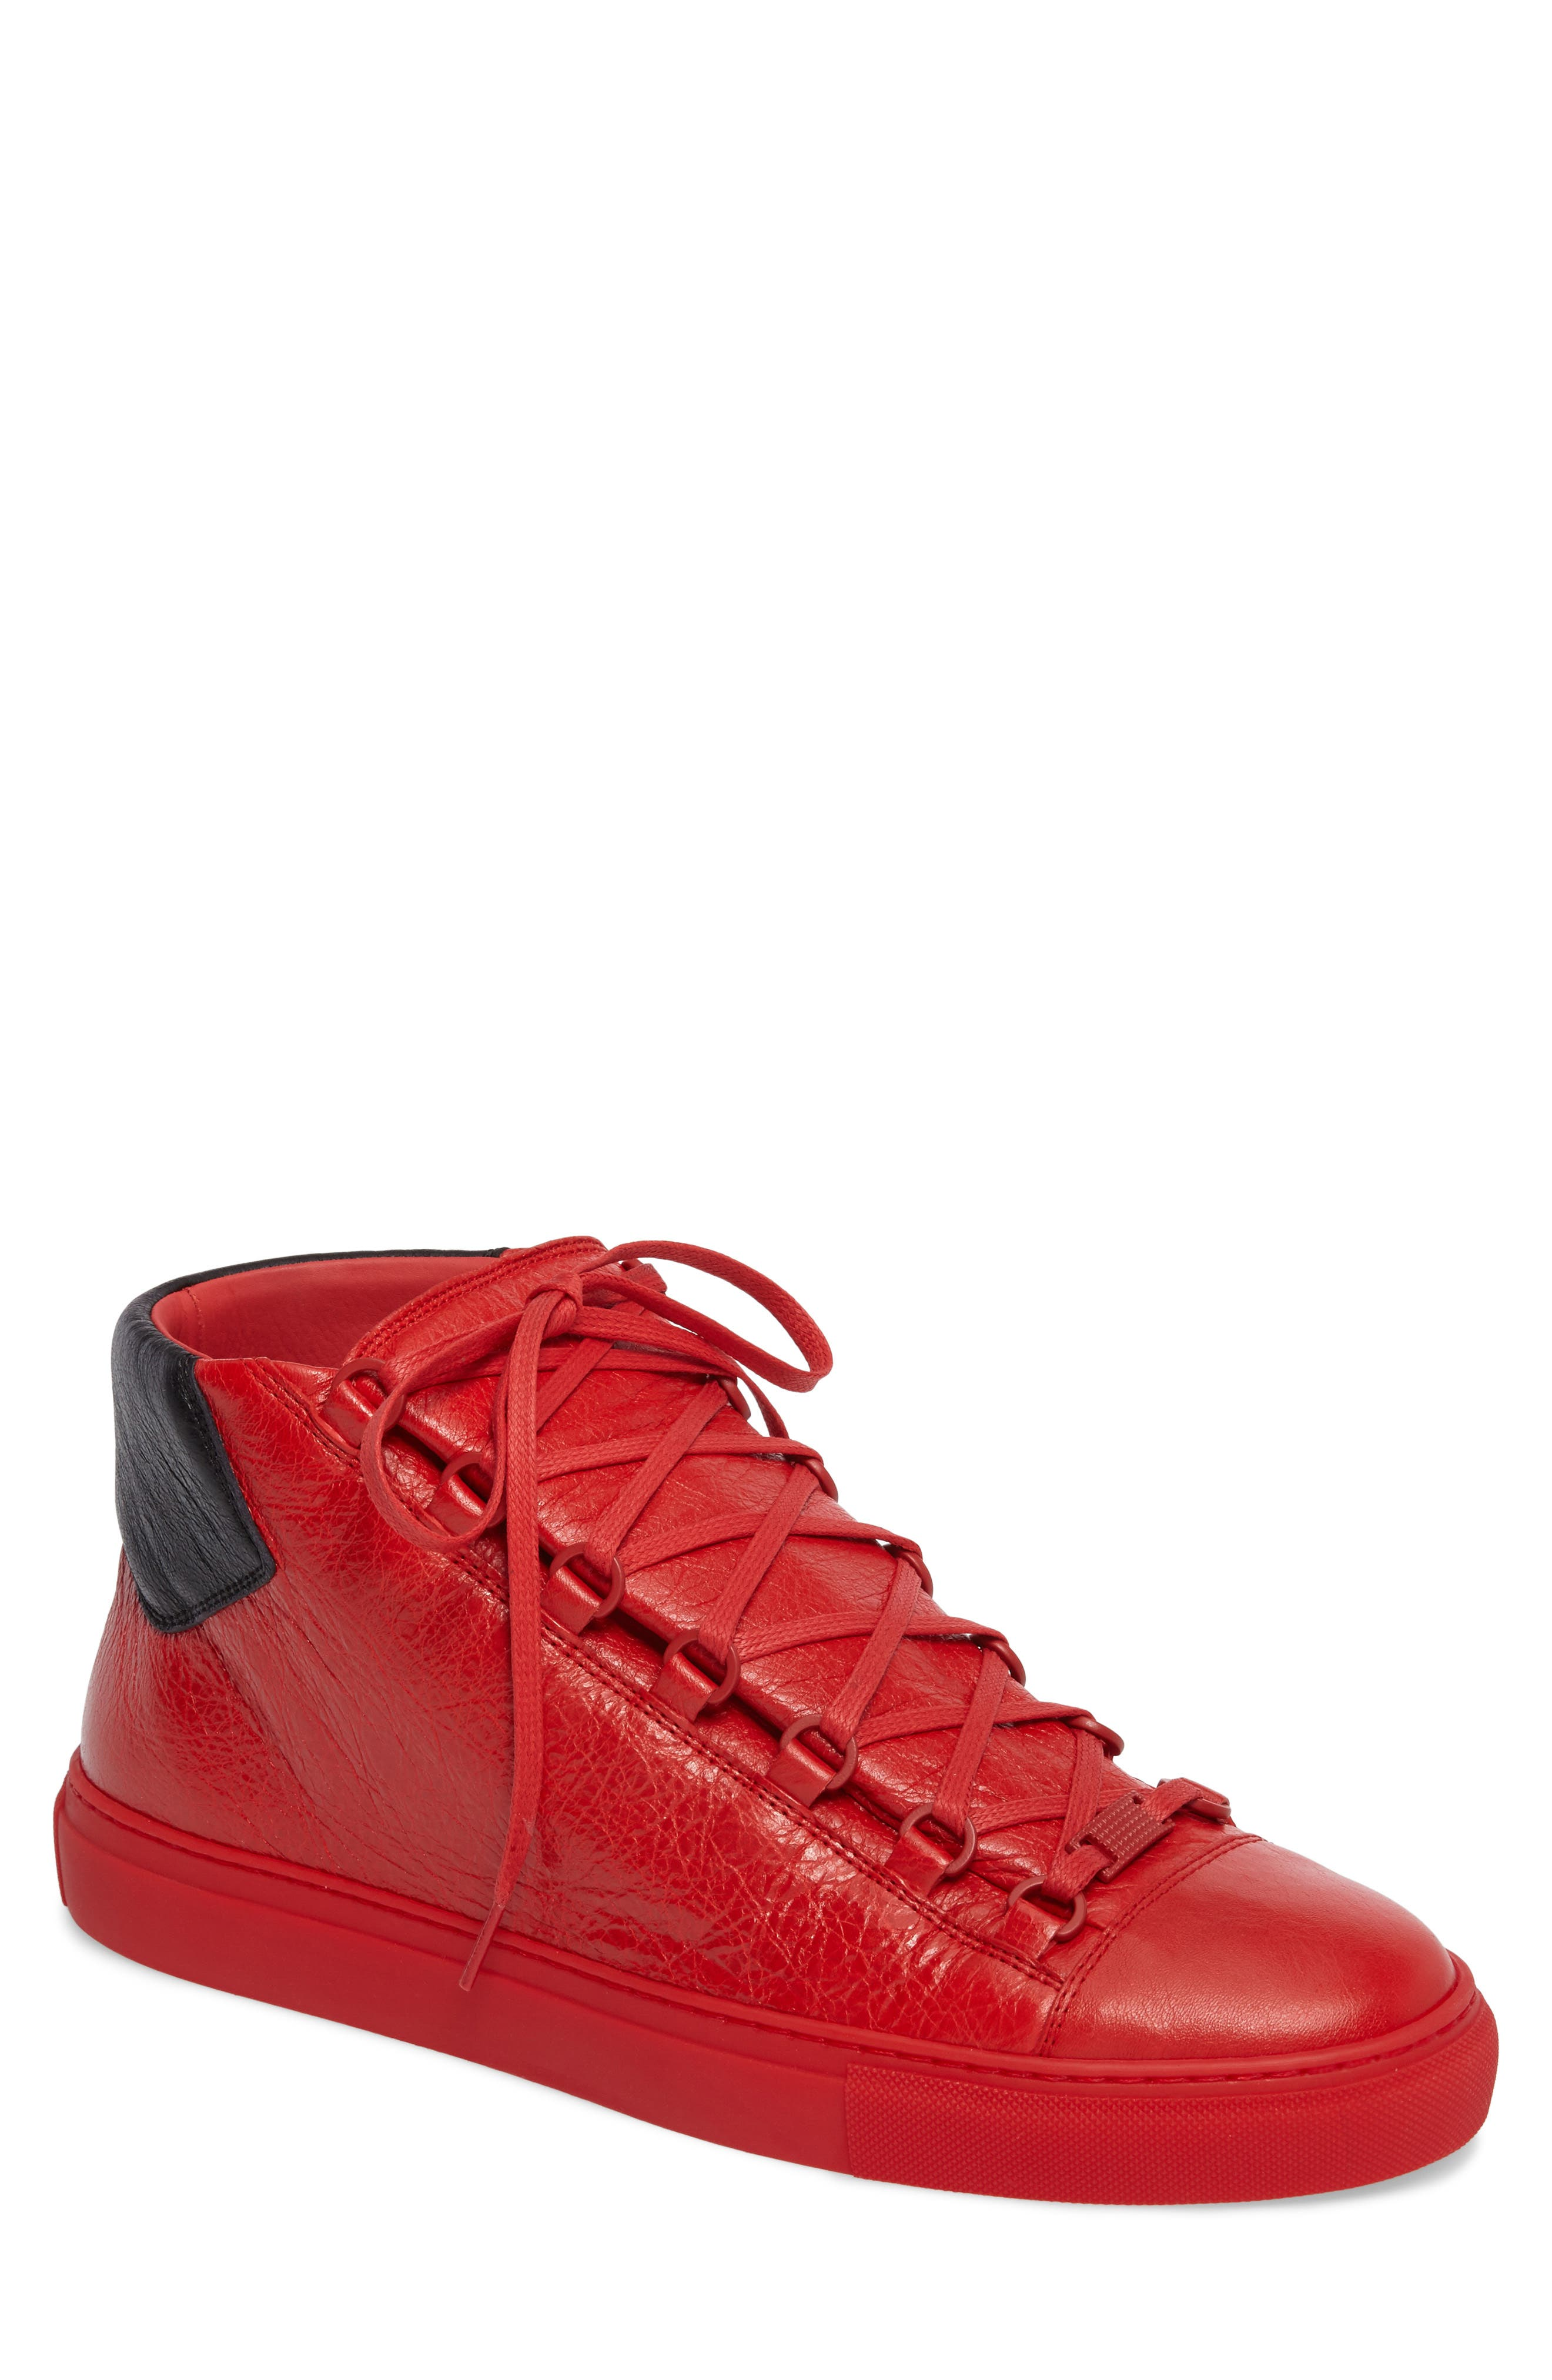 Arena High Sneaker,                             Main thumbnail 1, color,                             Rouge Paprika/ Noir Leather